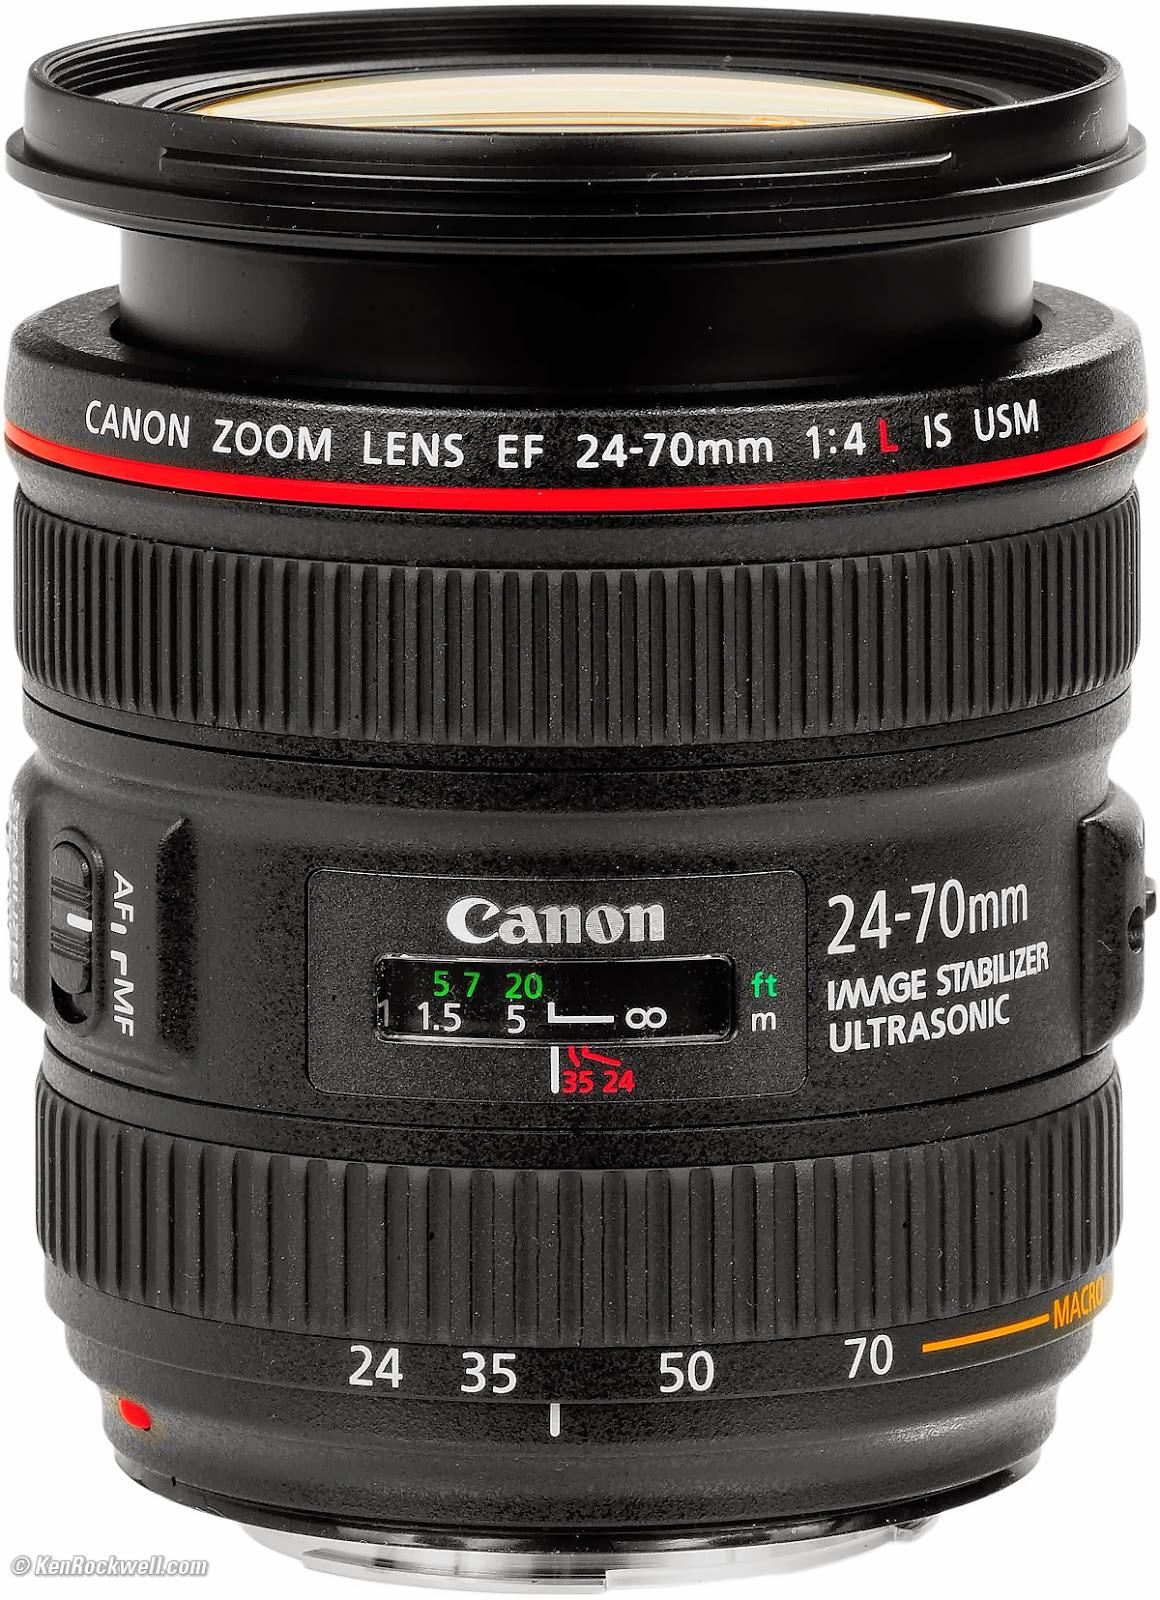 Harga Lensa Kamera Canon EF 24-70mm f/4L IS USM Terbaru